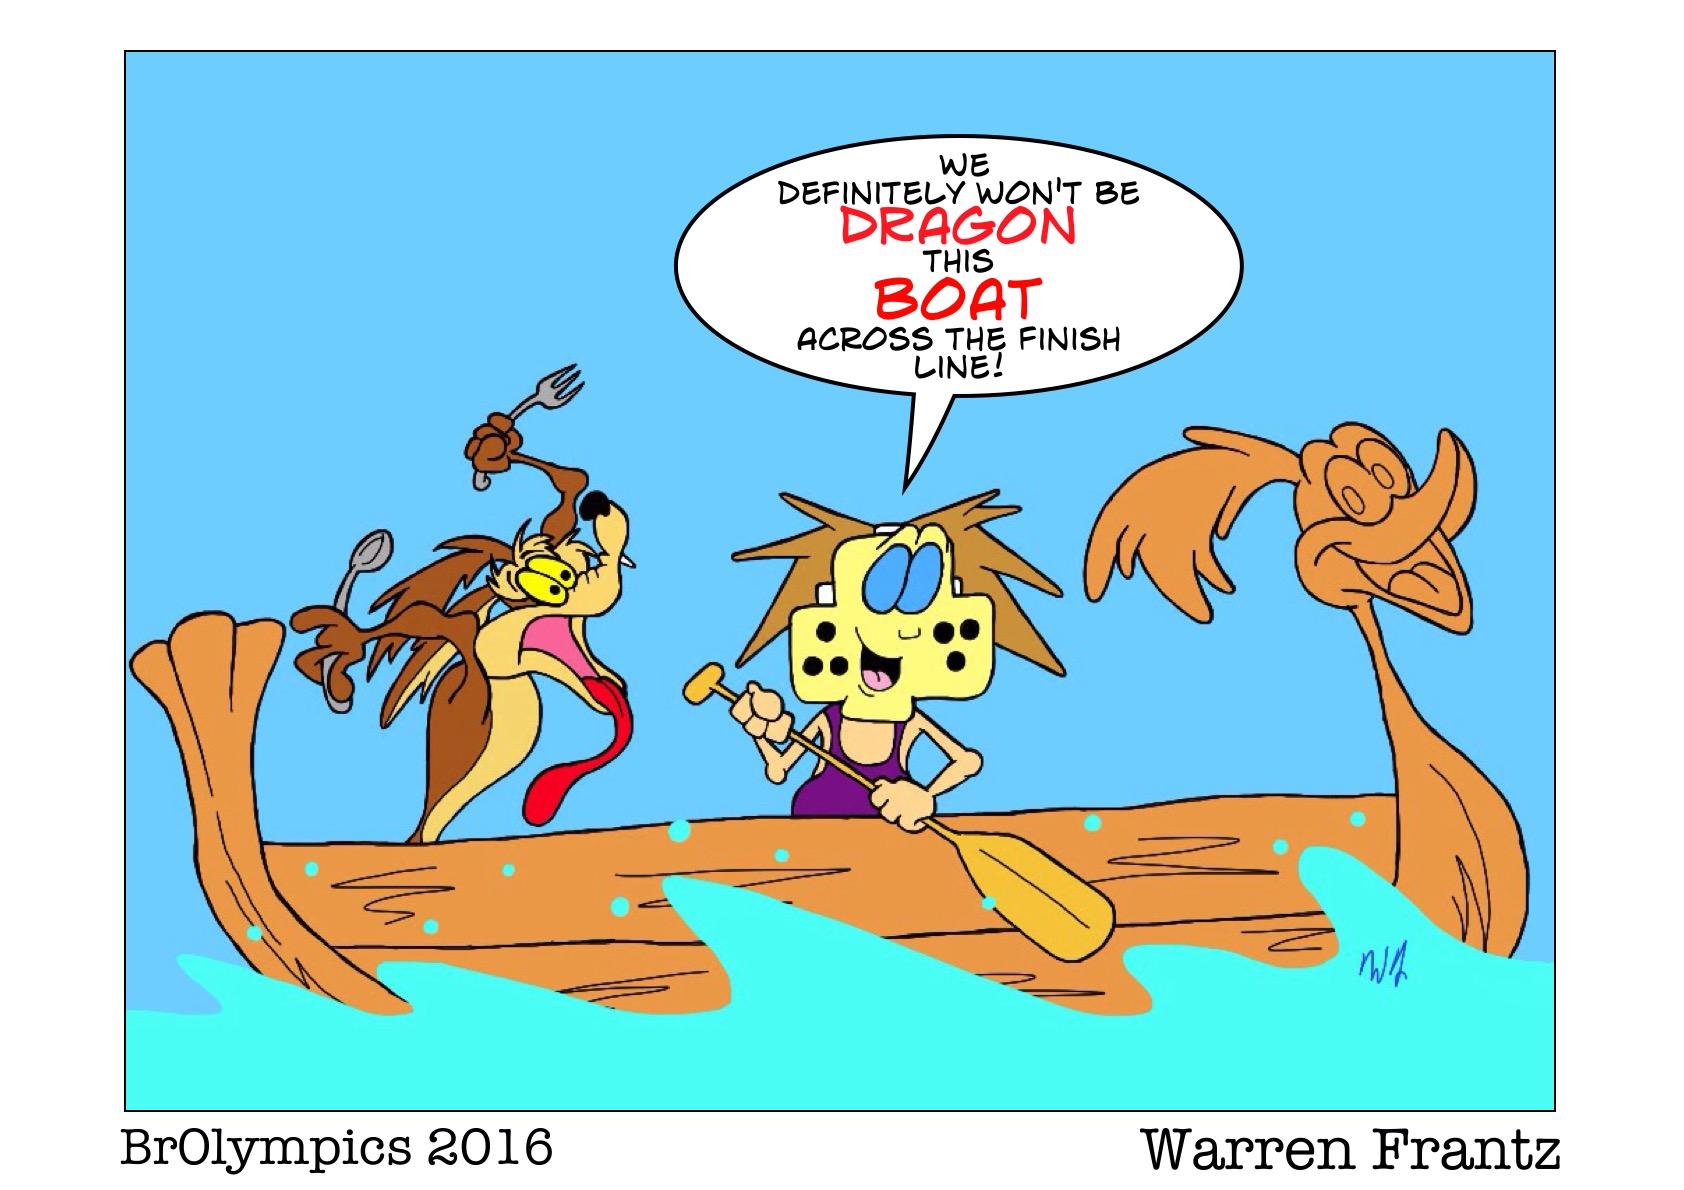 BrOlympic Dragon Boat